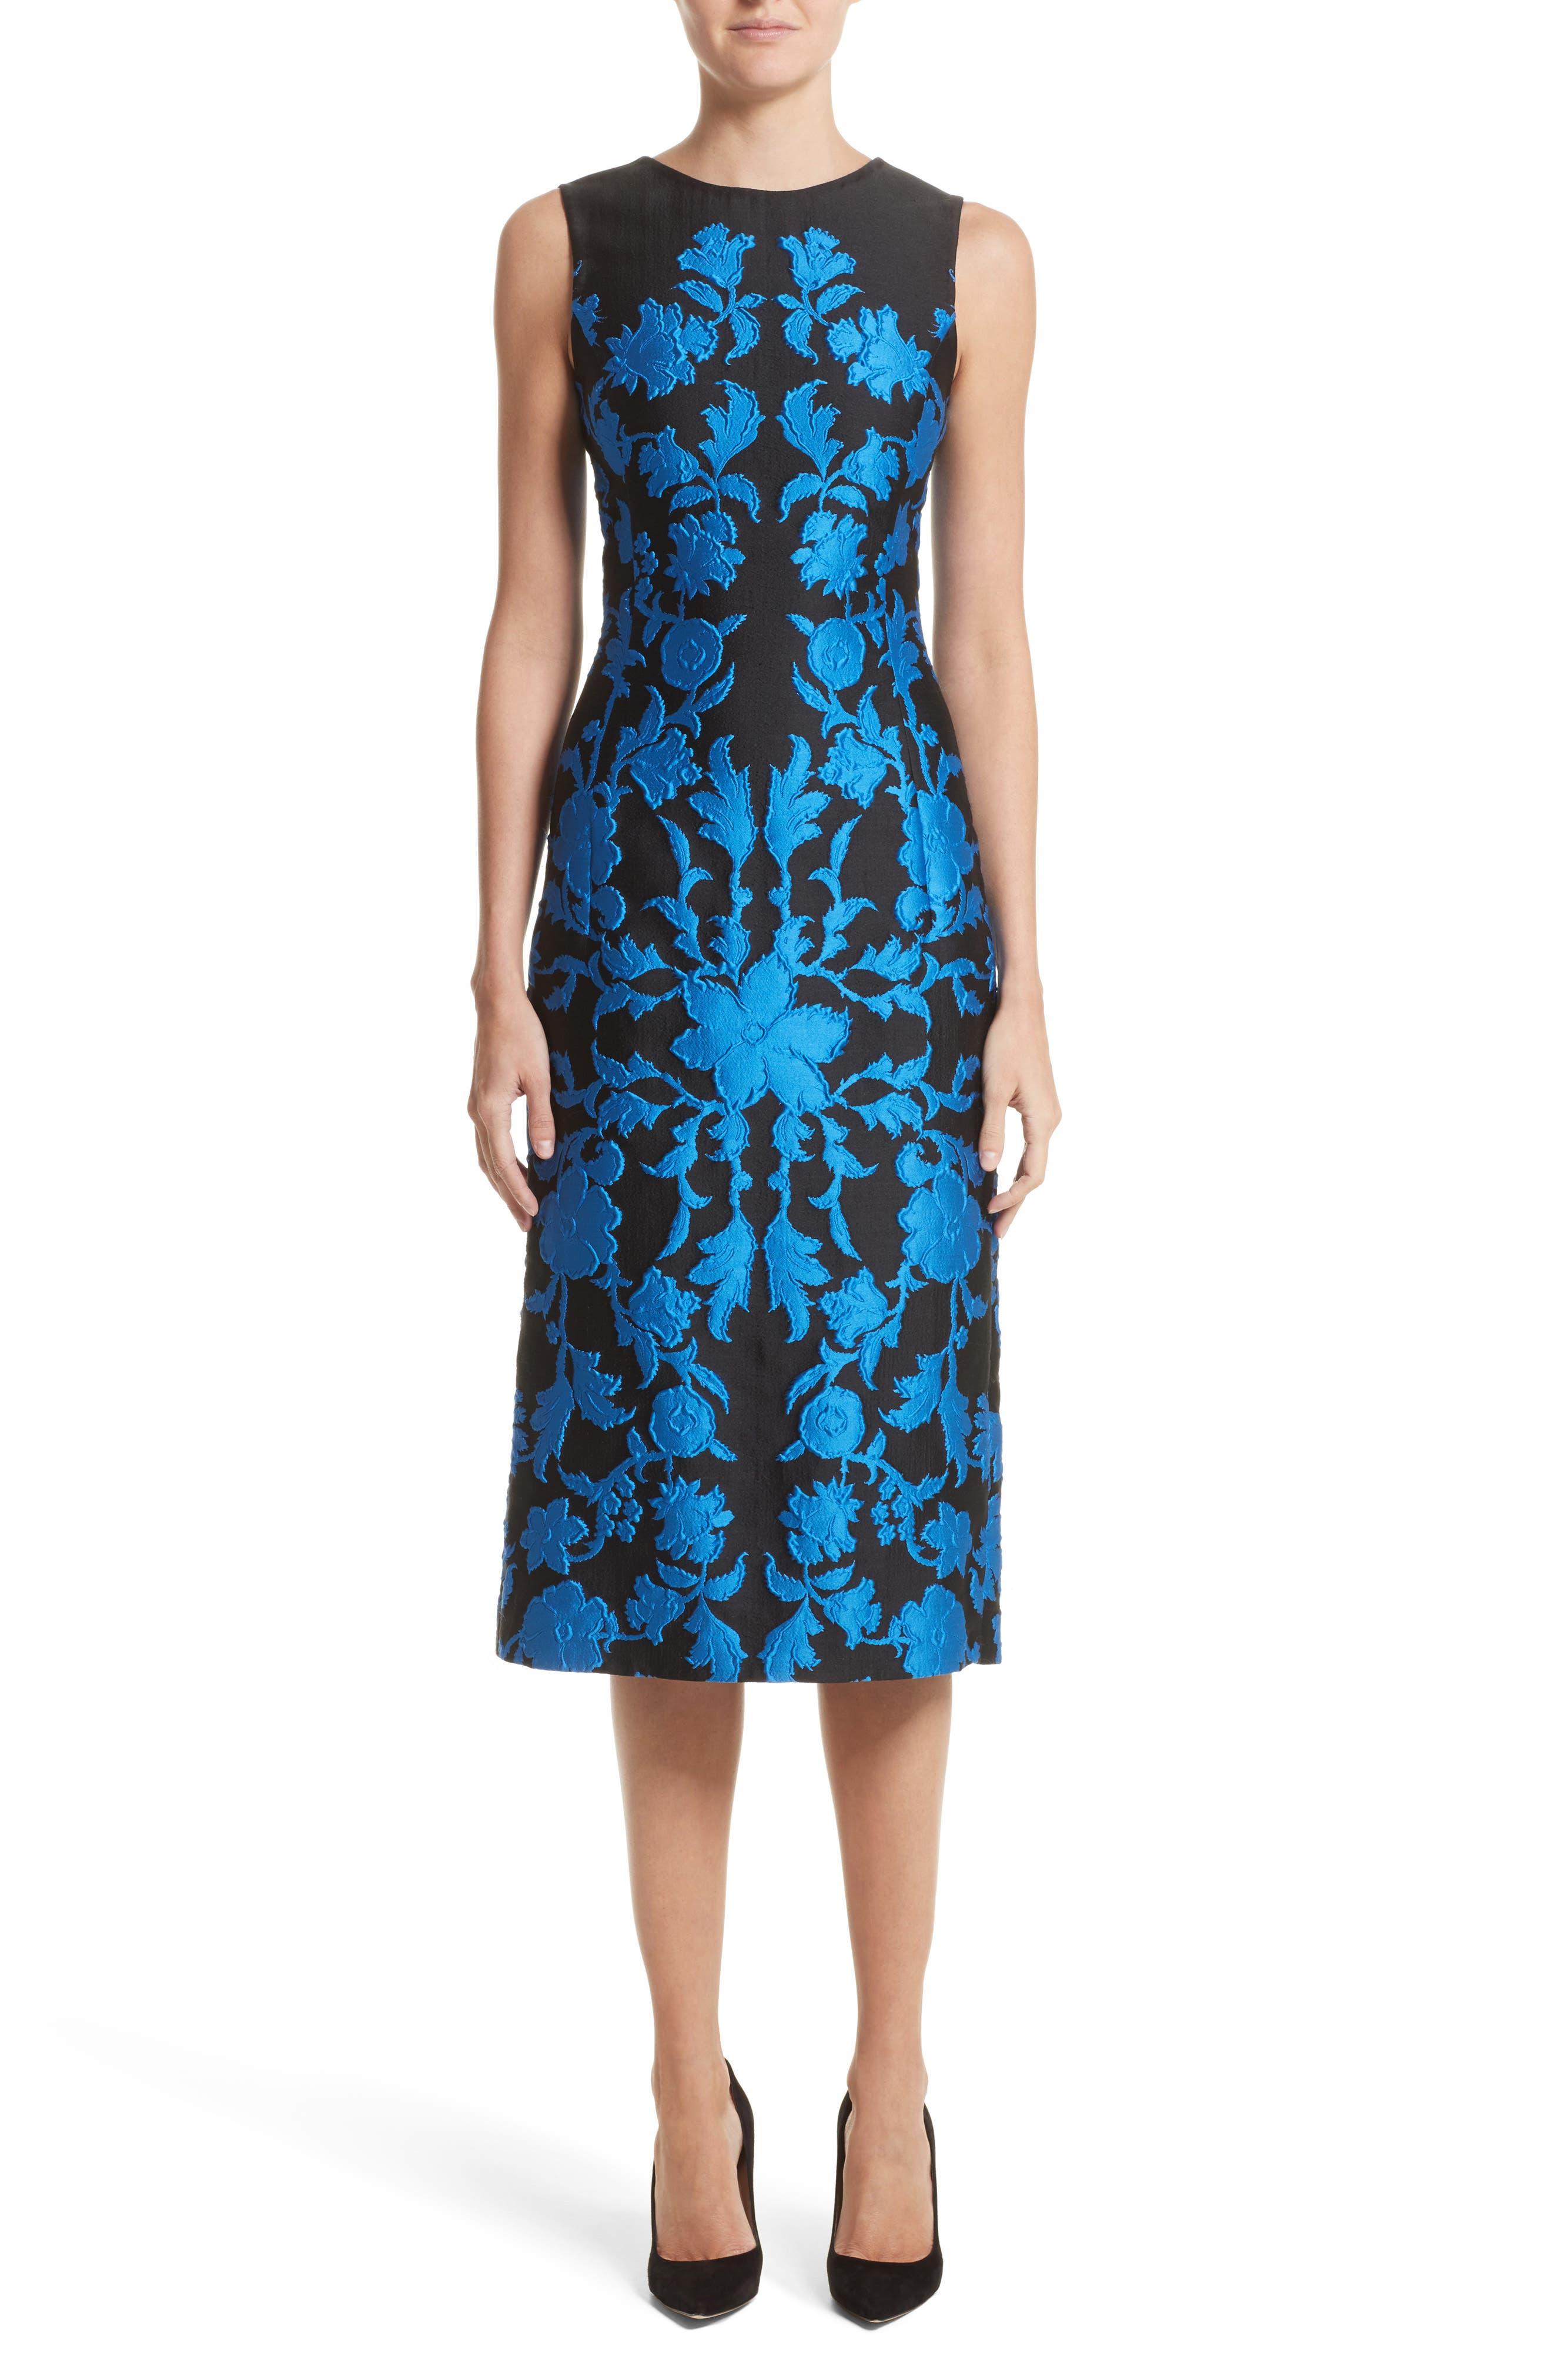 Alternate Image 1 Selected - Oscar de la Renta Matelassé Floral Jacquard Dress